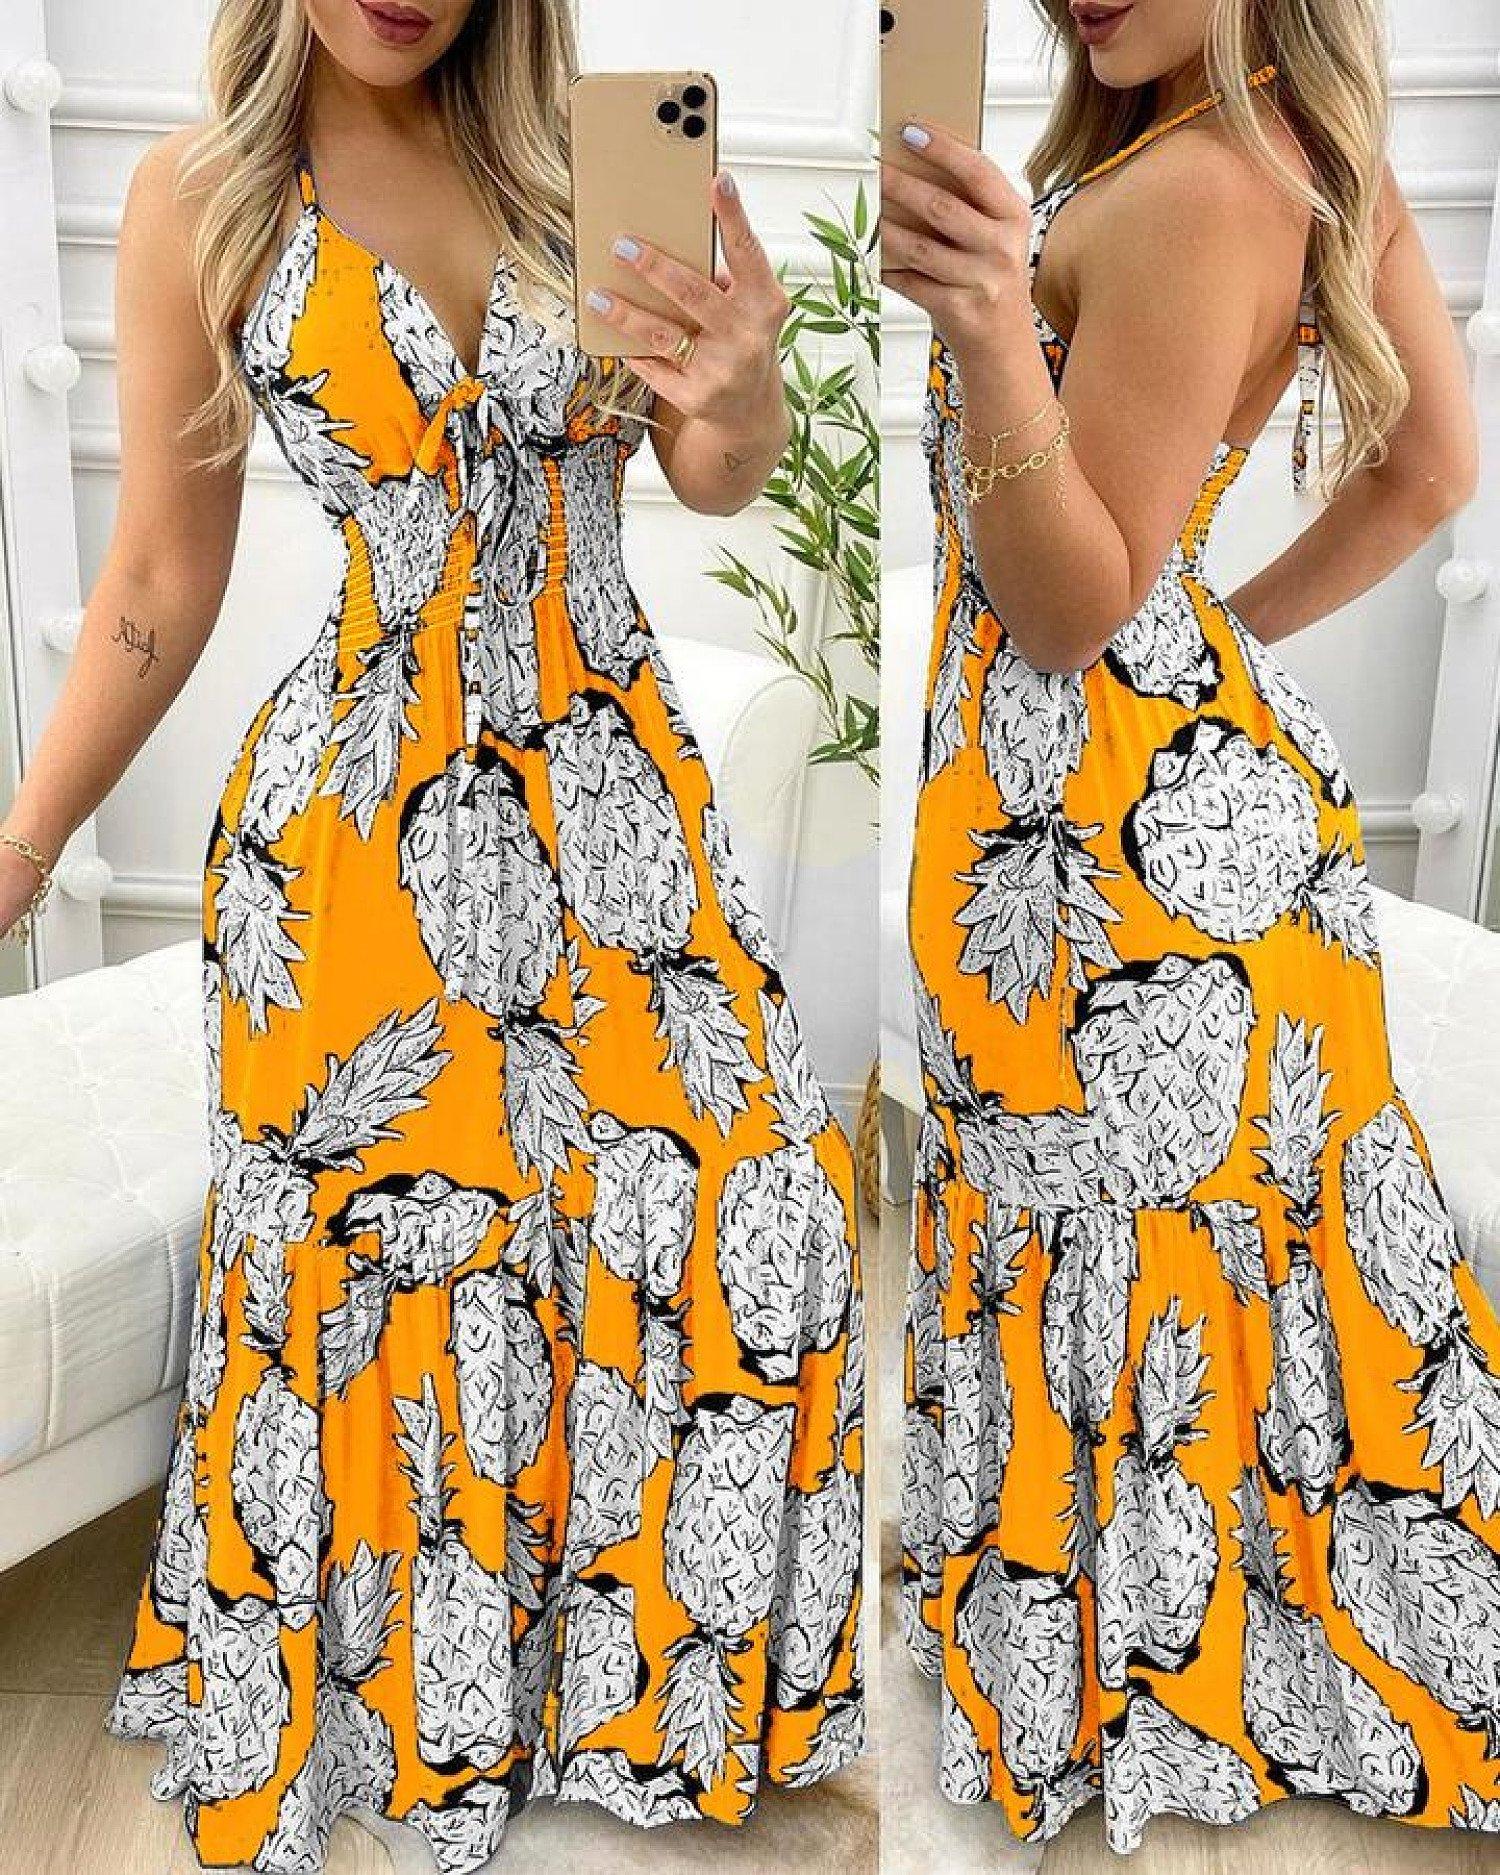 Pineapple Print Halter Ruffle Hem Maxi Dress-Yellow Free Postage